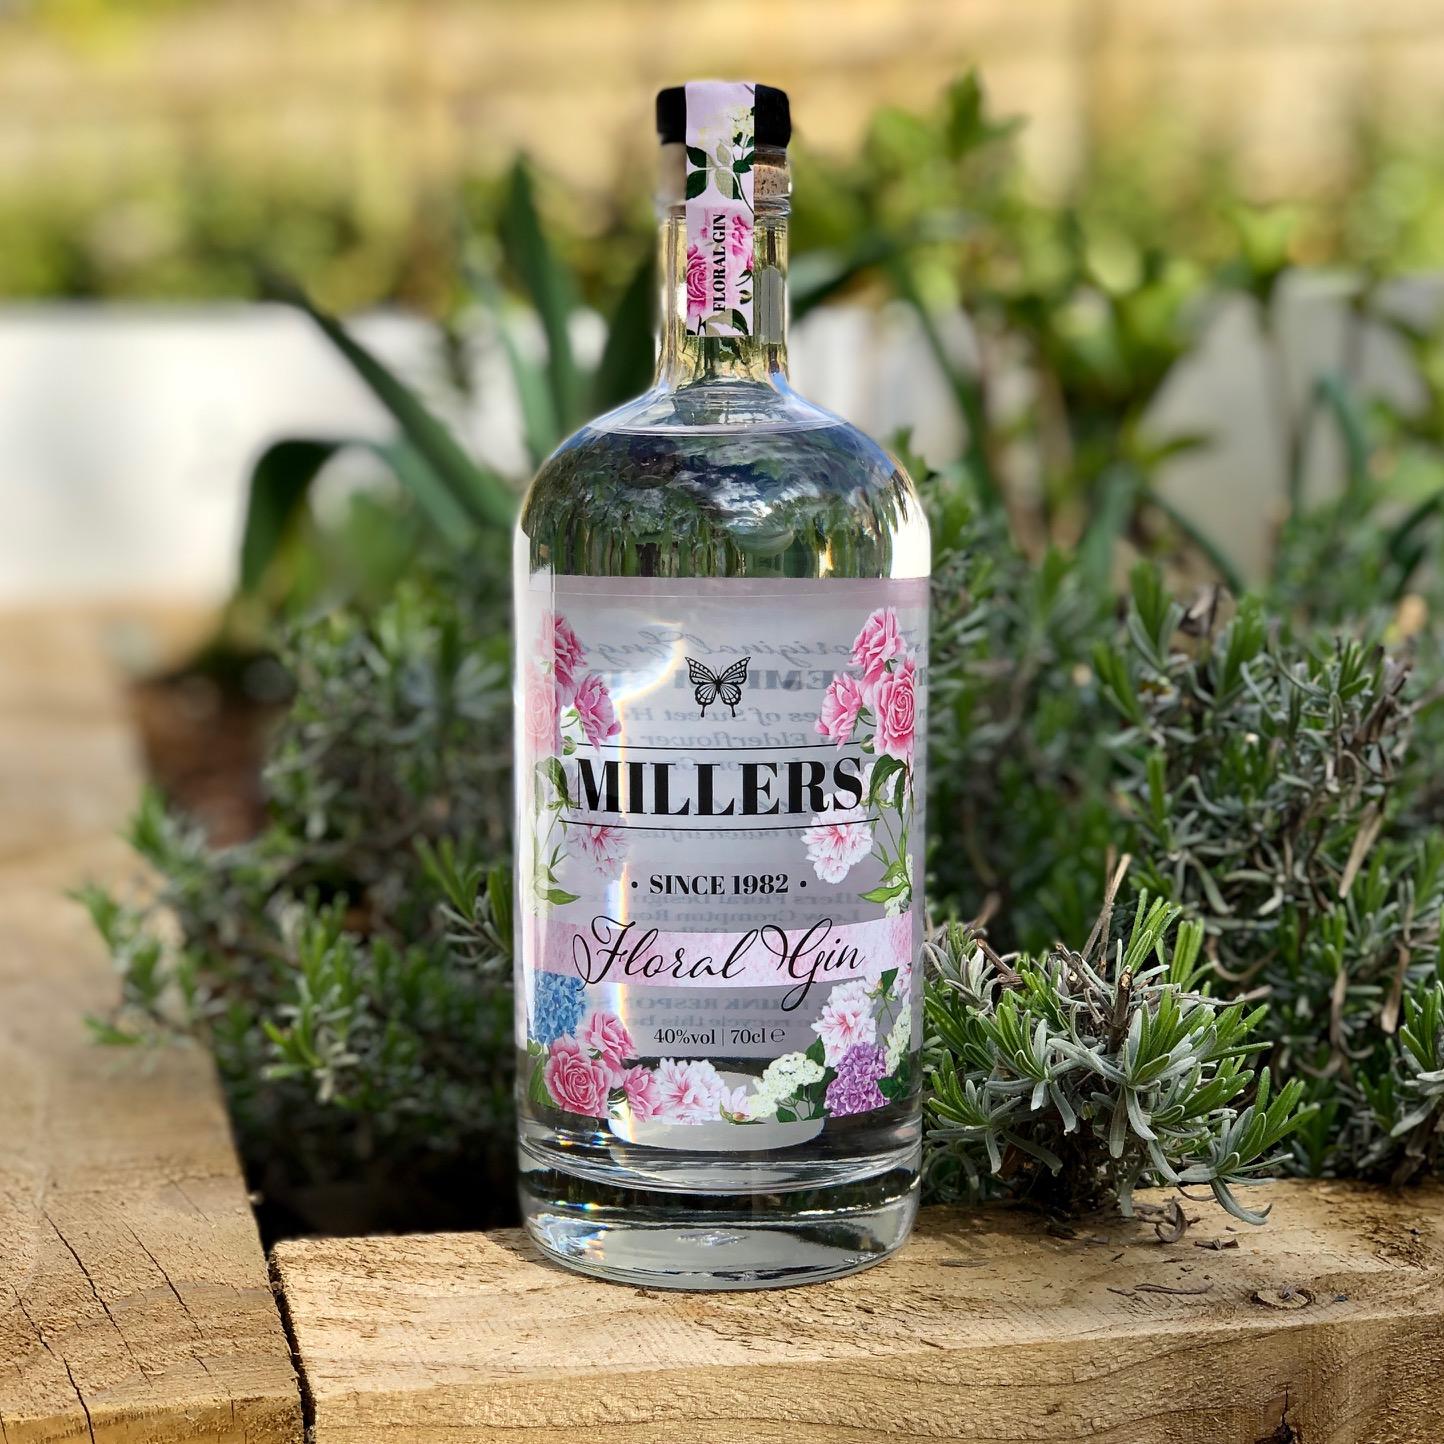 Millers Floral Design Gin label illustration and production